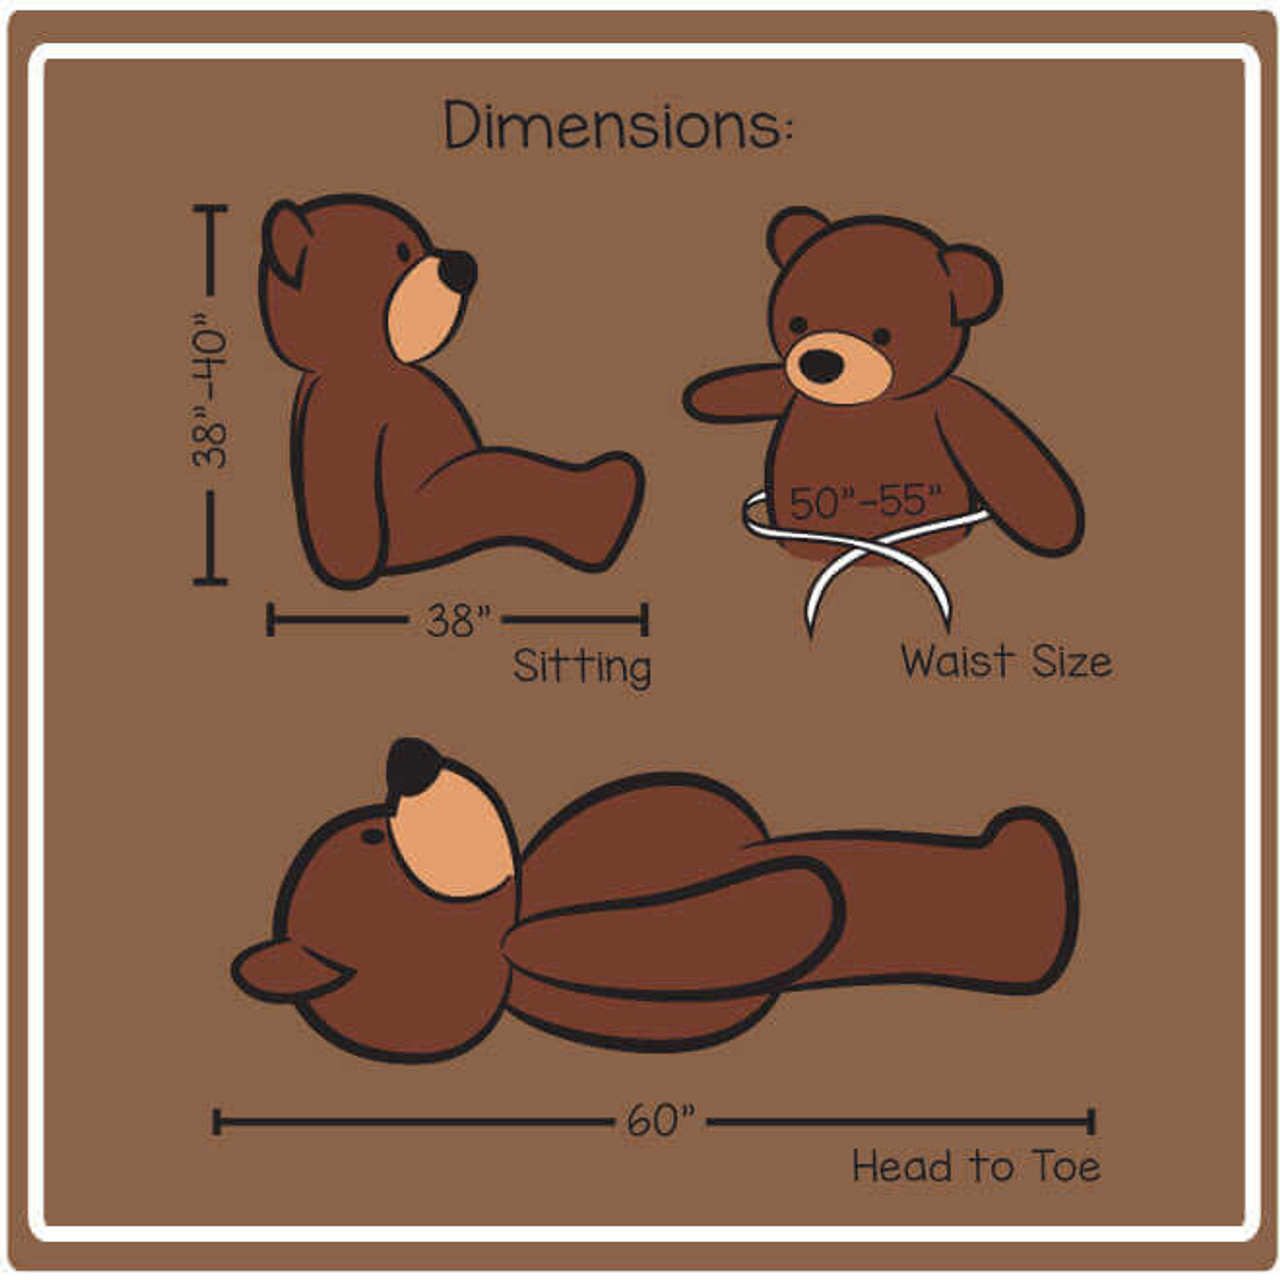 5ft Cozy Cuddles Dimensions